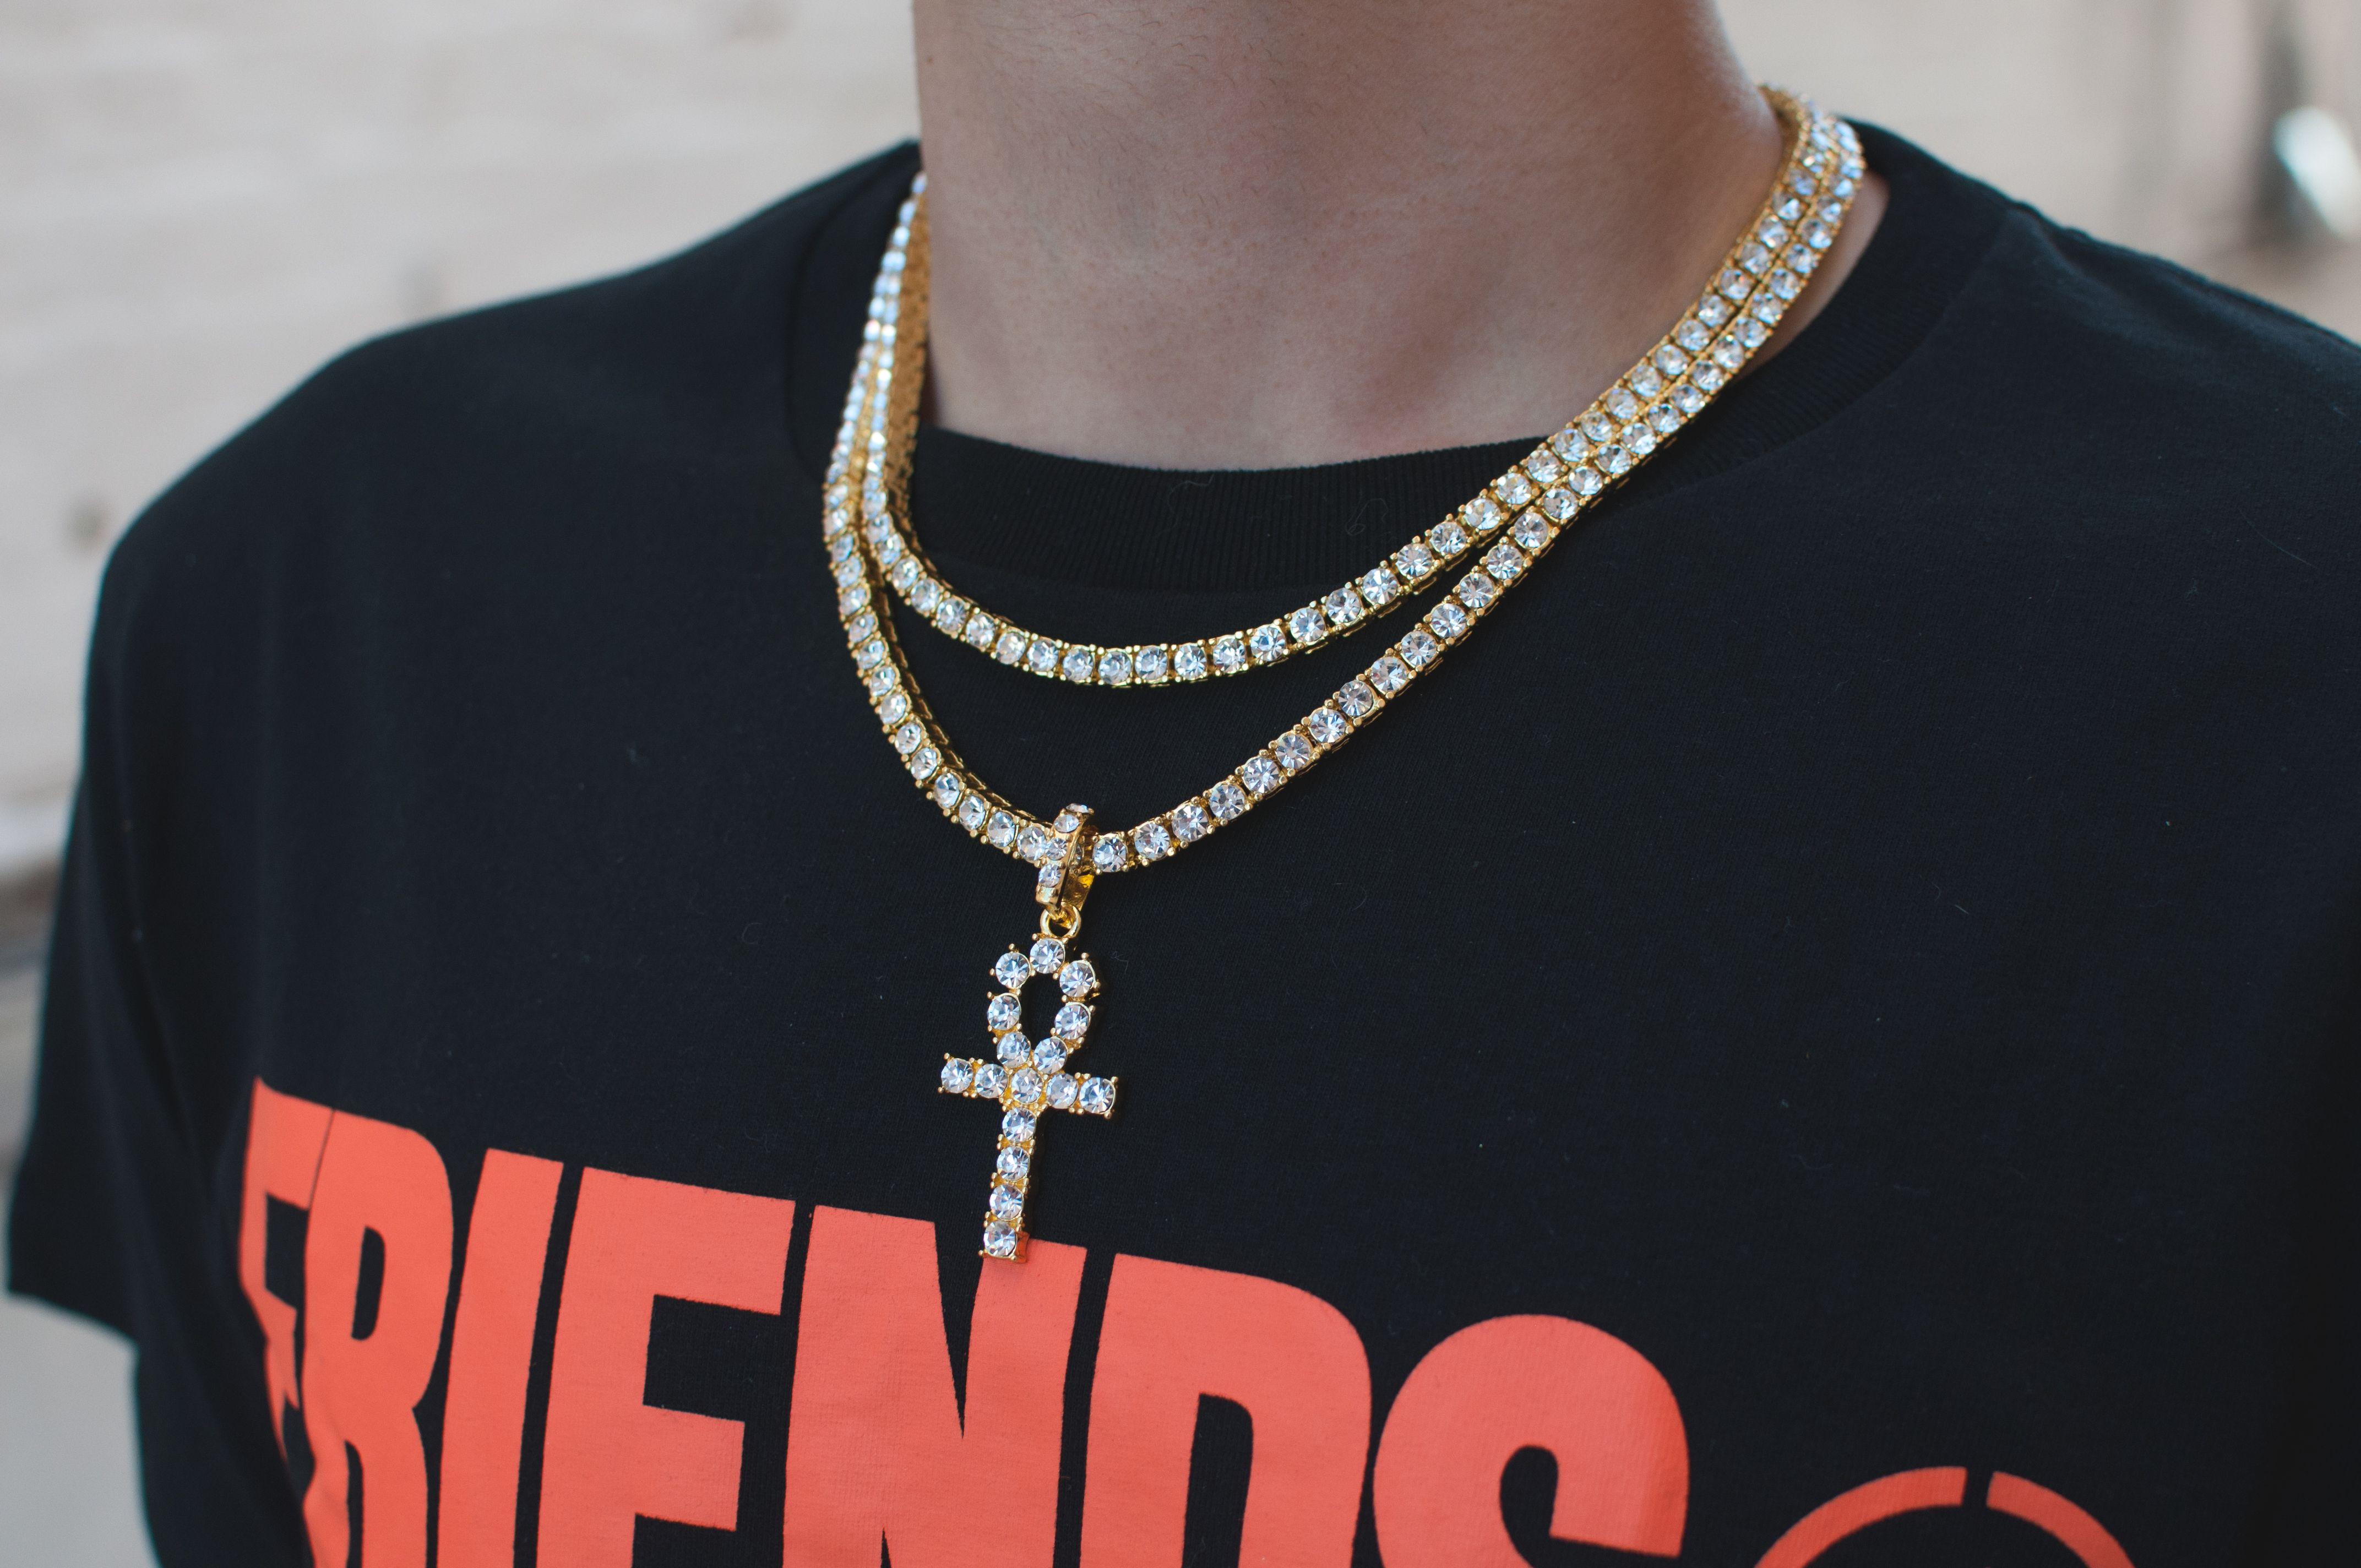 18k Gold Diamond Tennis Chain Bundle w Ankh jewelry gold ankh